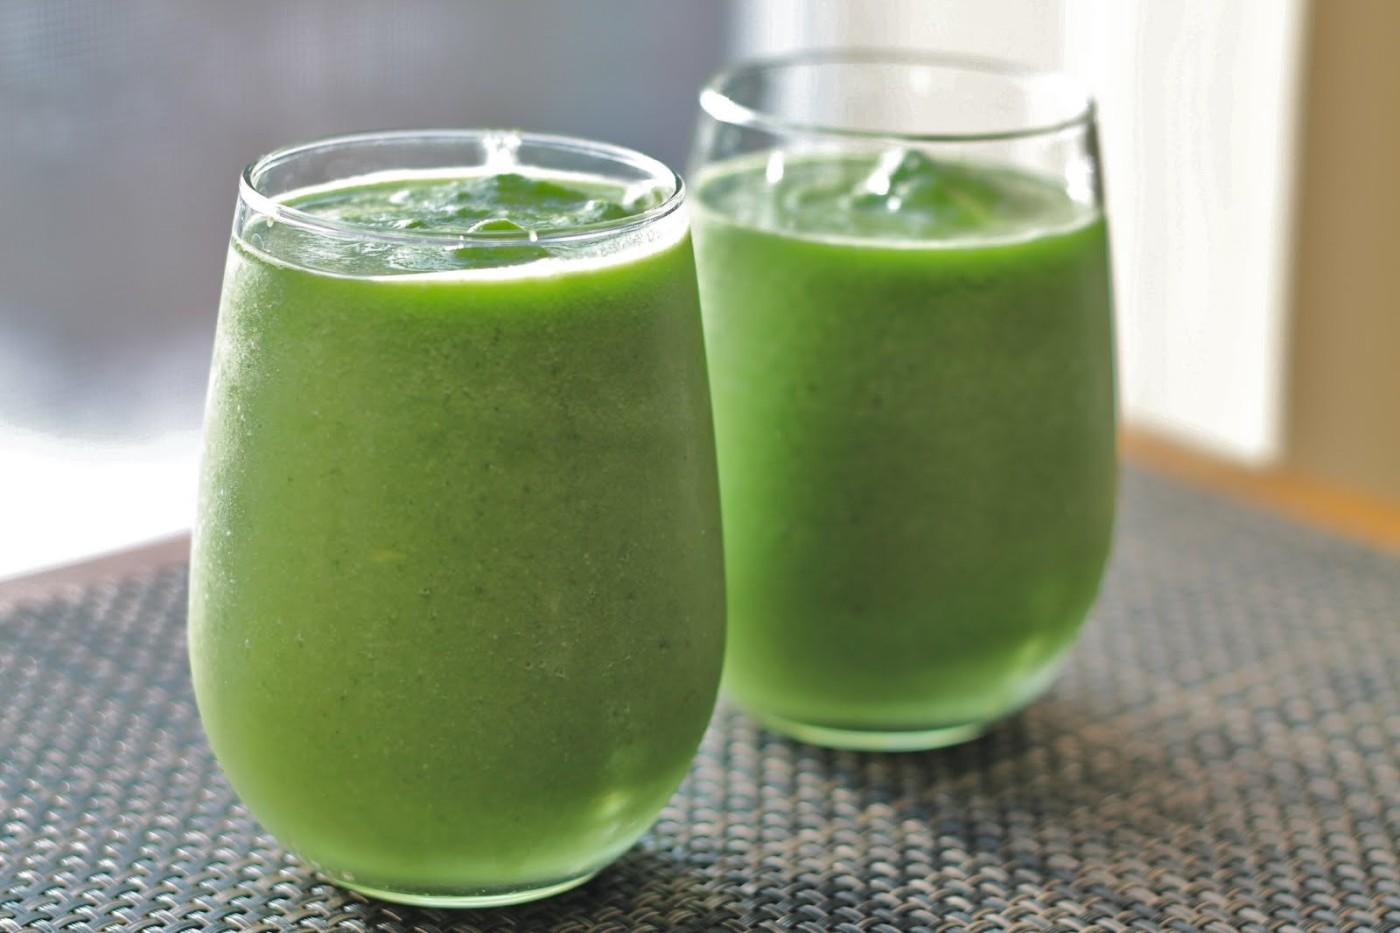 Green smothie